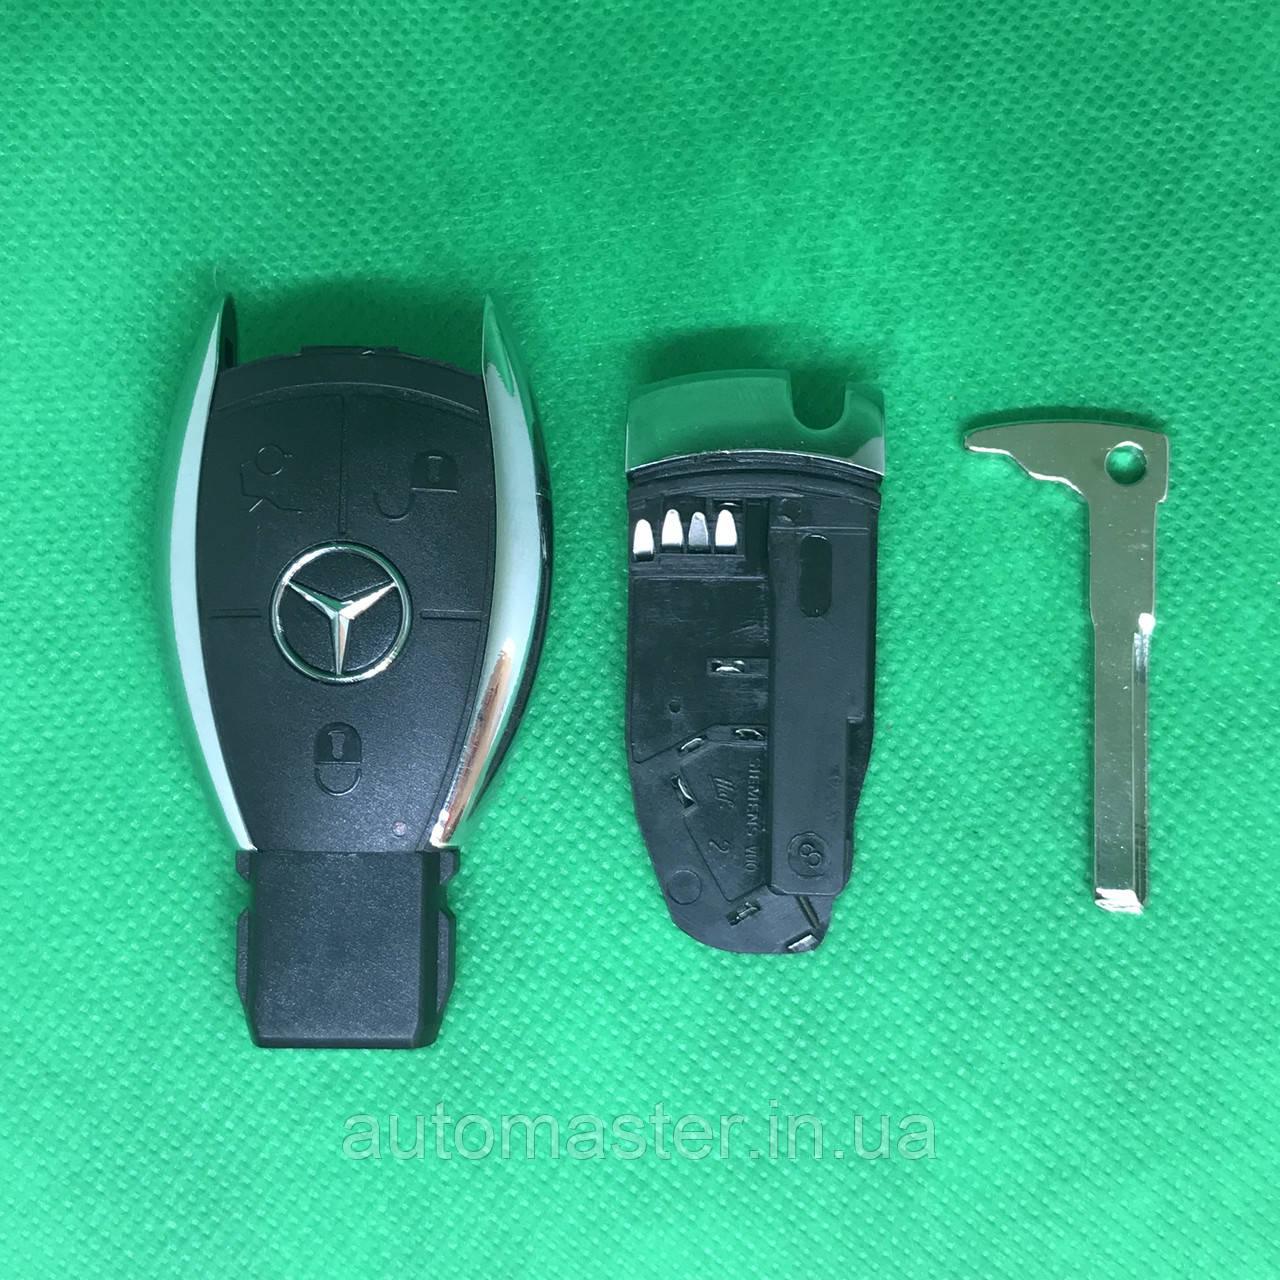 Корпус для смарт автоключа Мерседес MERCEDES (мерседес) 3 кнопки